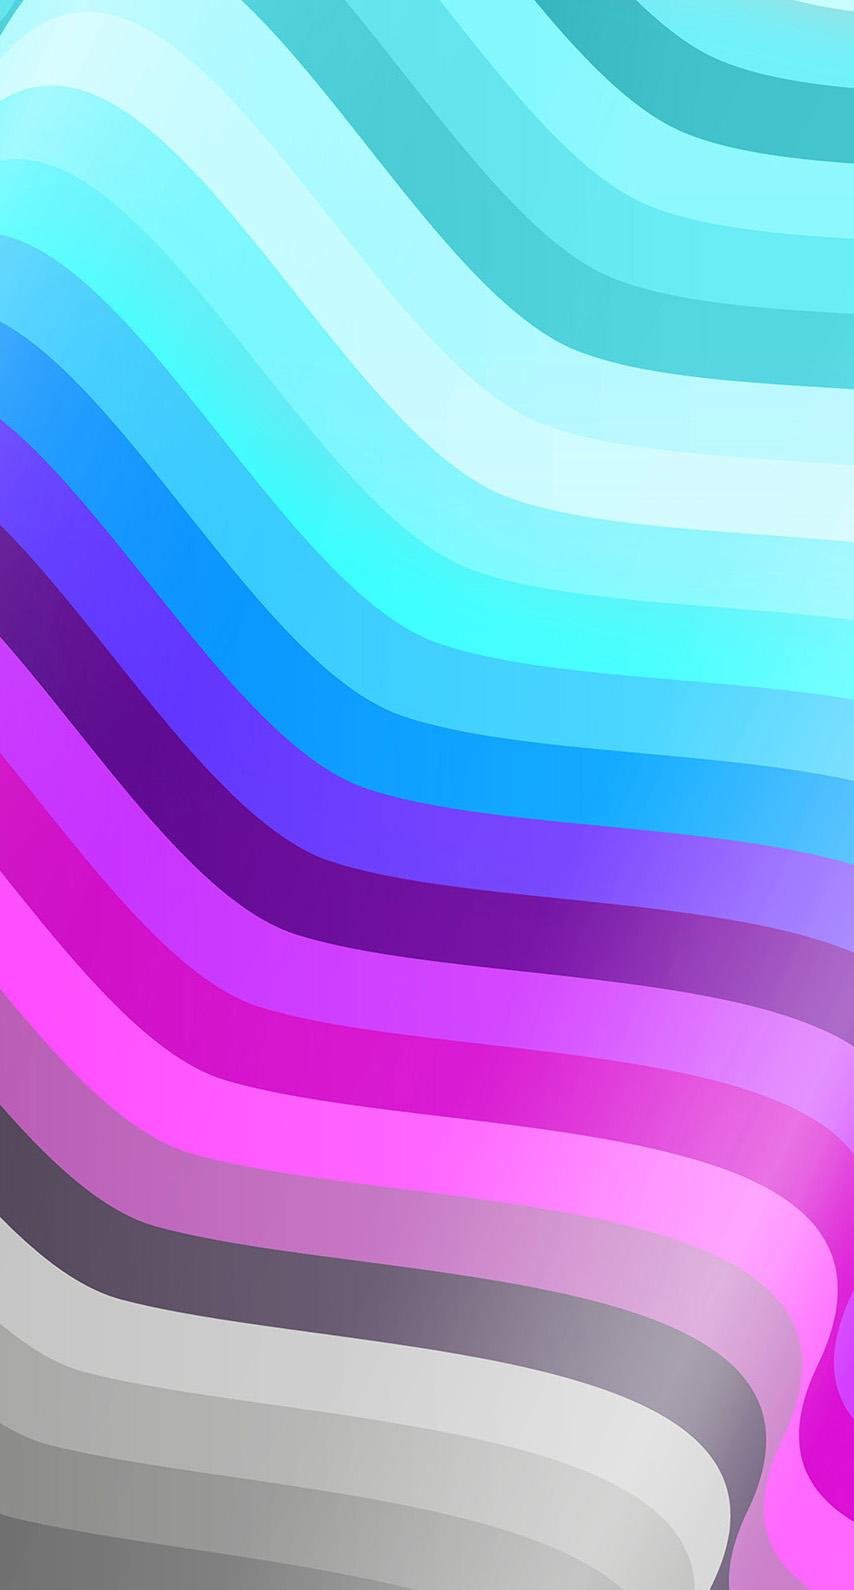 wallpaper, desktop, illustration, shape, stripe, graphic design, no person, motley, contemporary, cover, style, crinkled